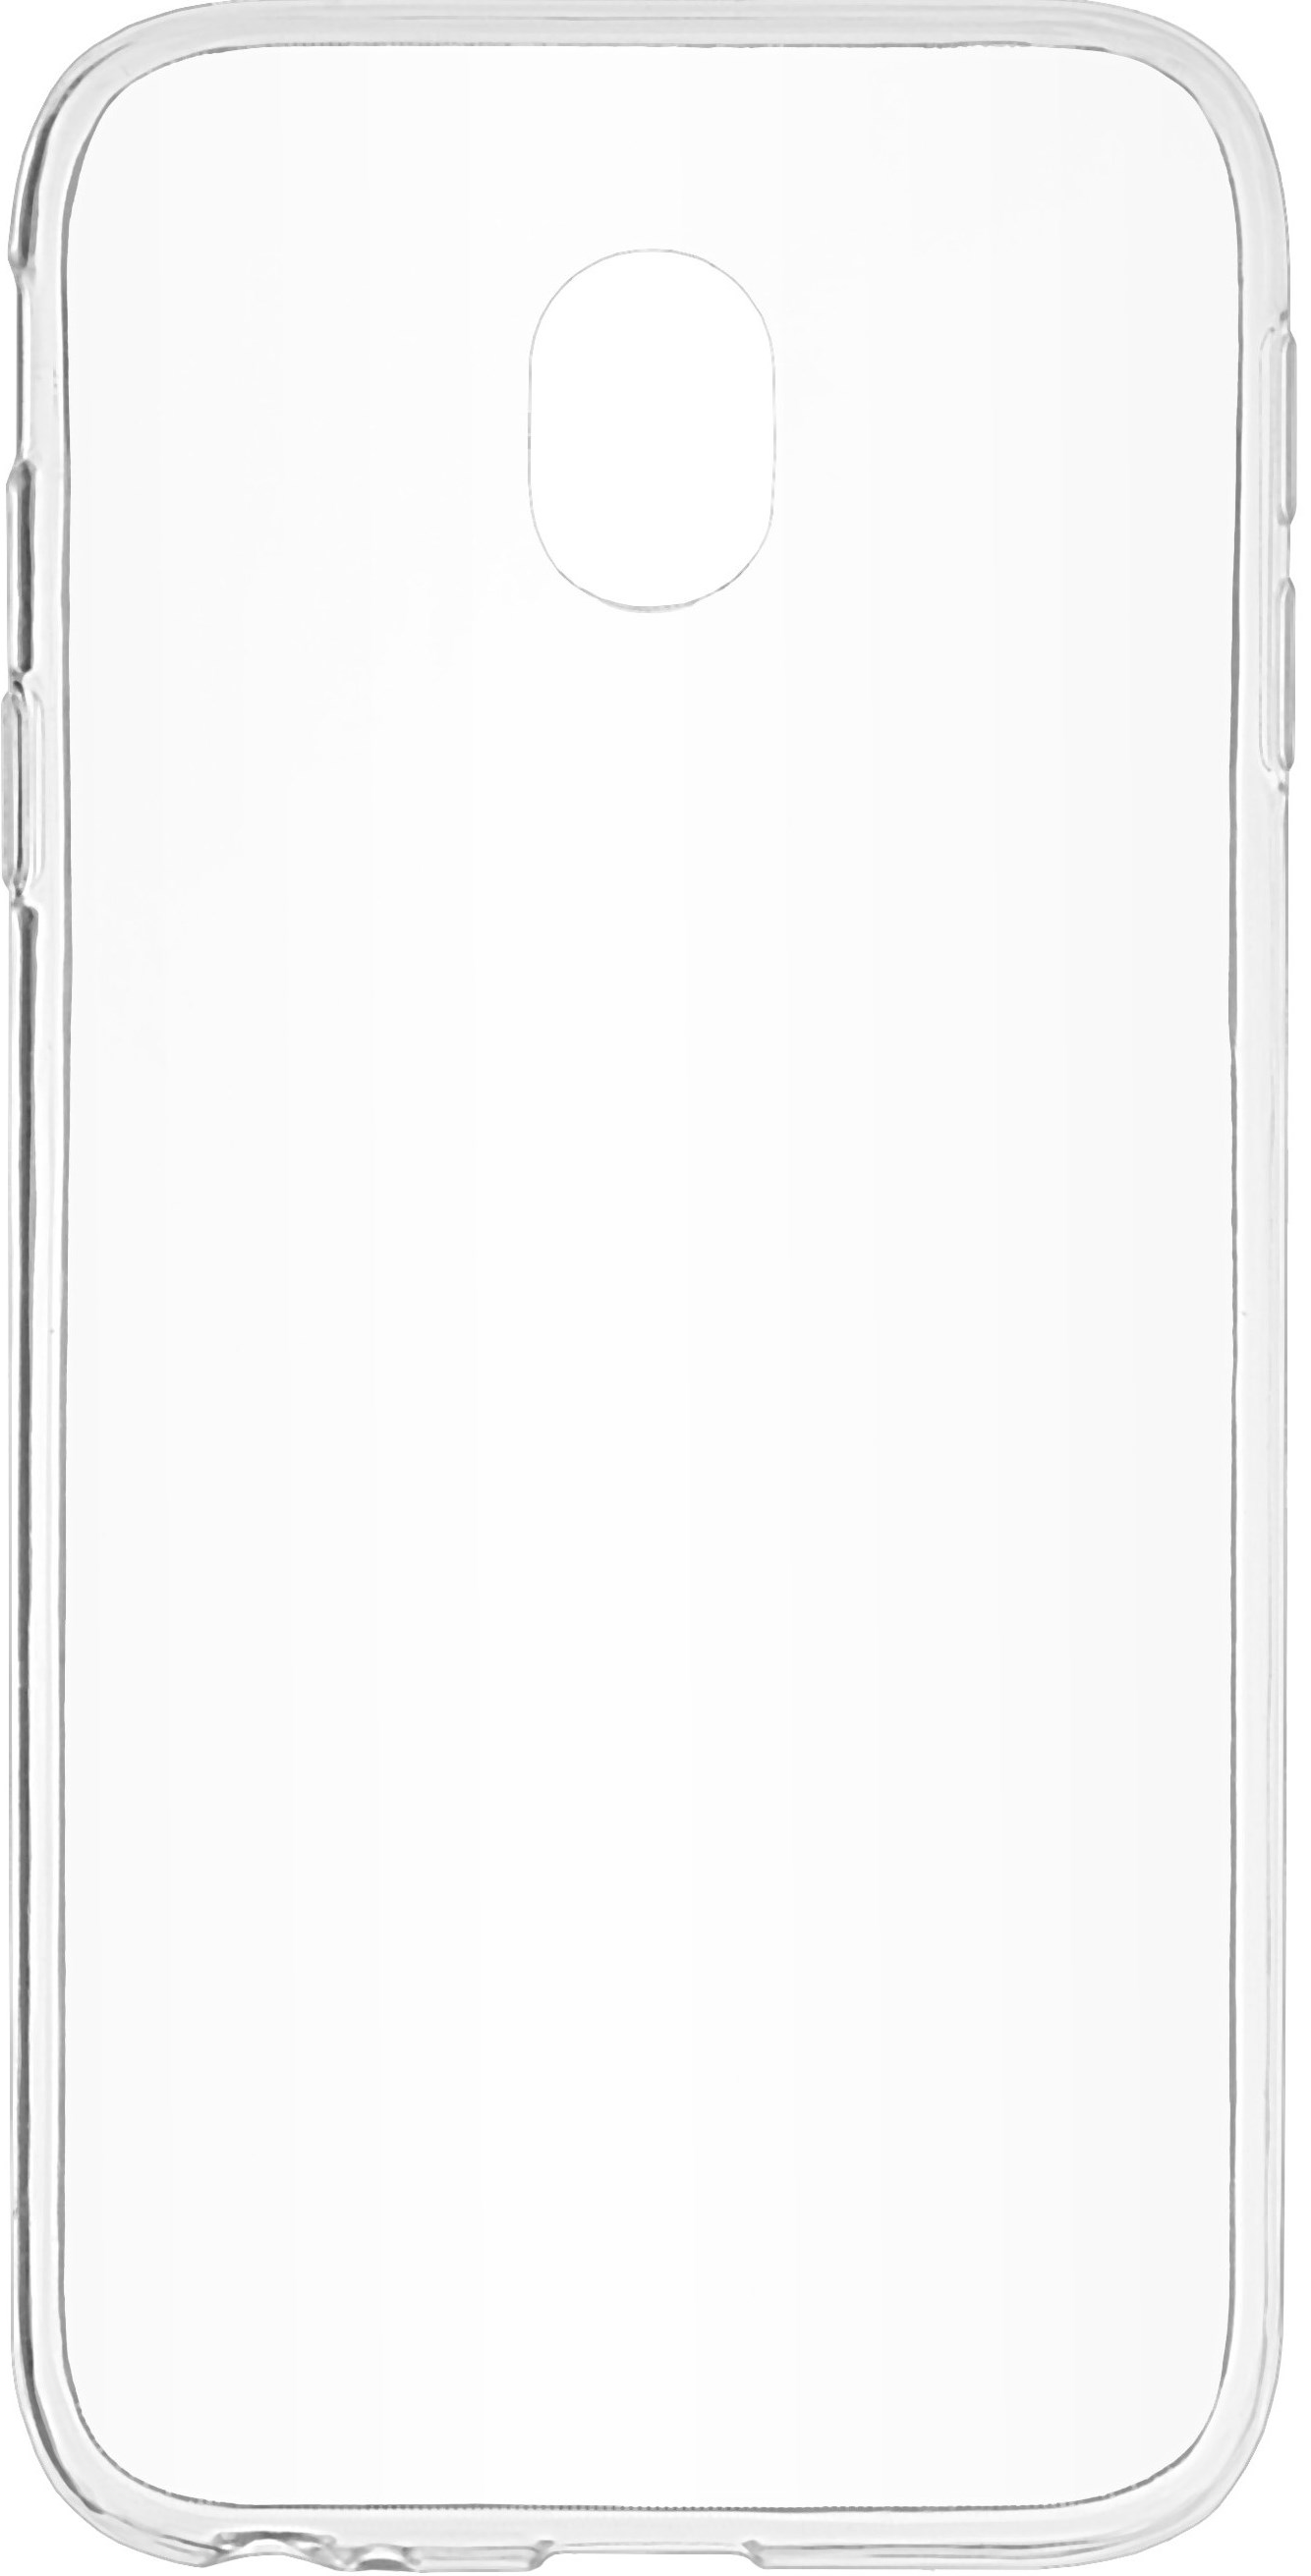 Чехол для сотового телефона skinBOX Slim Silicone, 4660041409178, прозрачный цена и фото